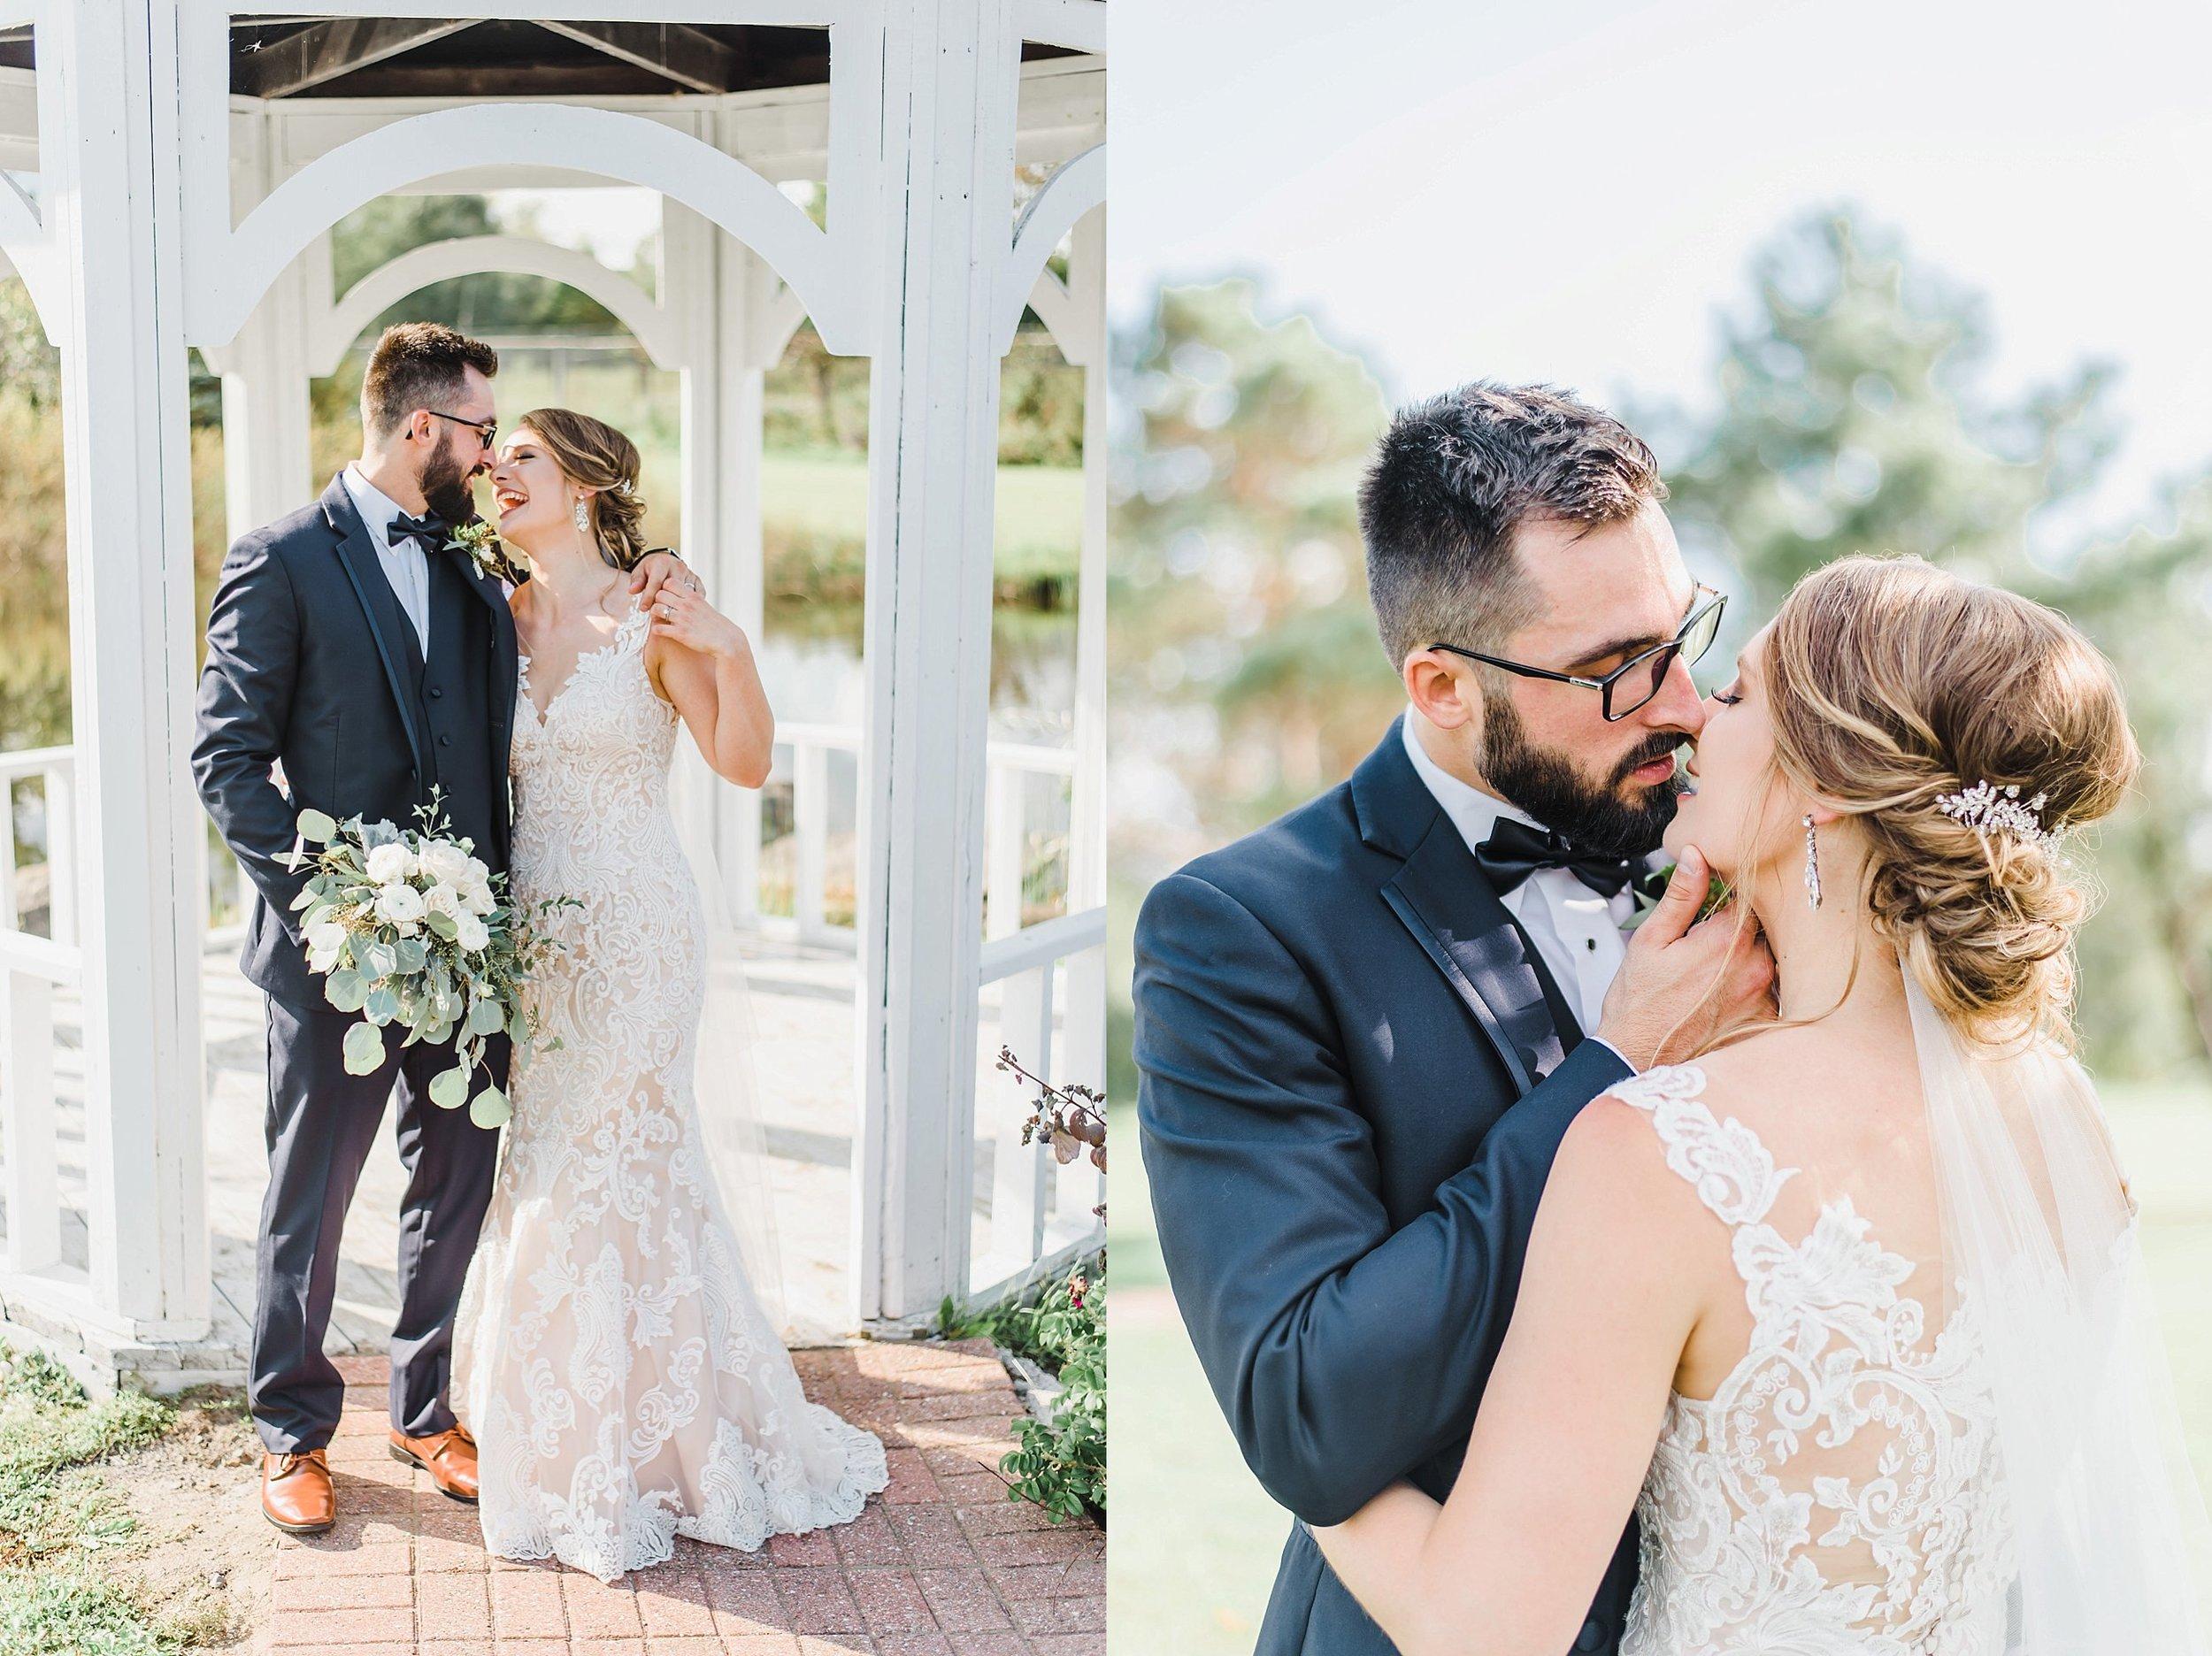 light airy indie fine art ottawa wedding photographer | Ali and Batoul Photography_1300.jpg